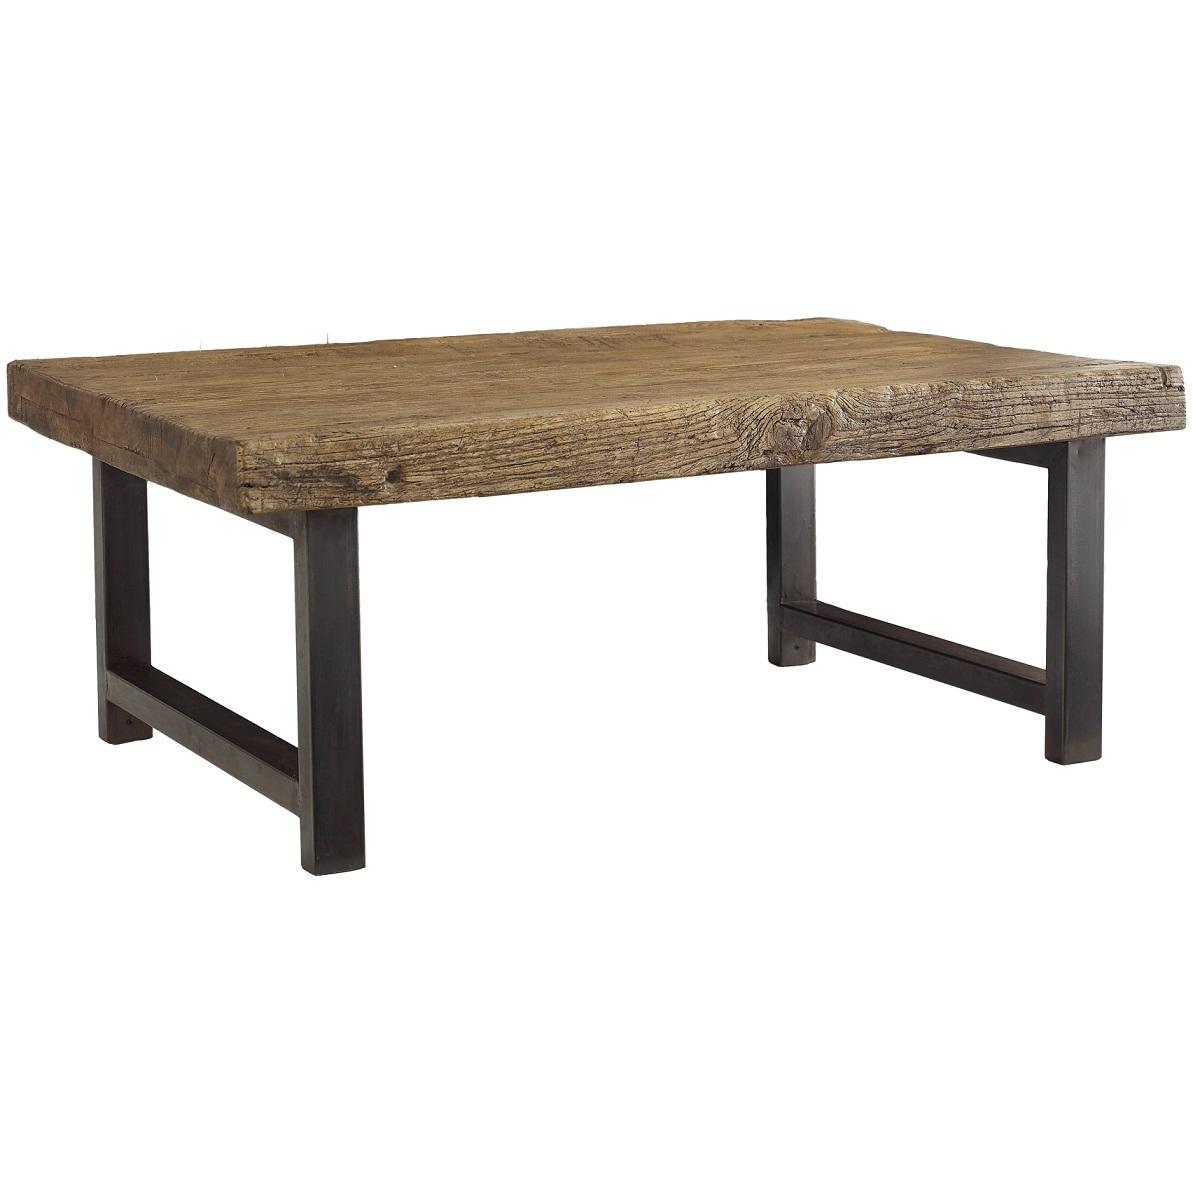 wood coffee table metal legs photo - 3